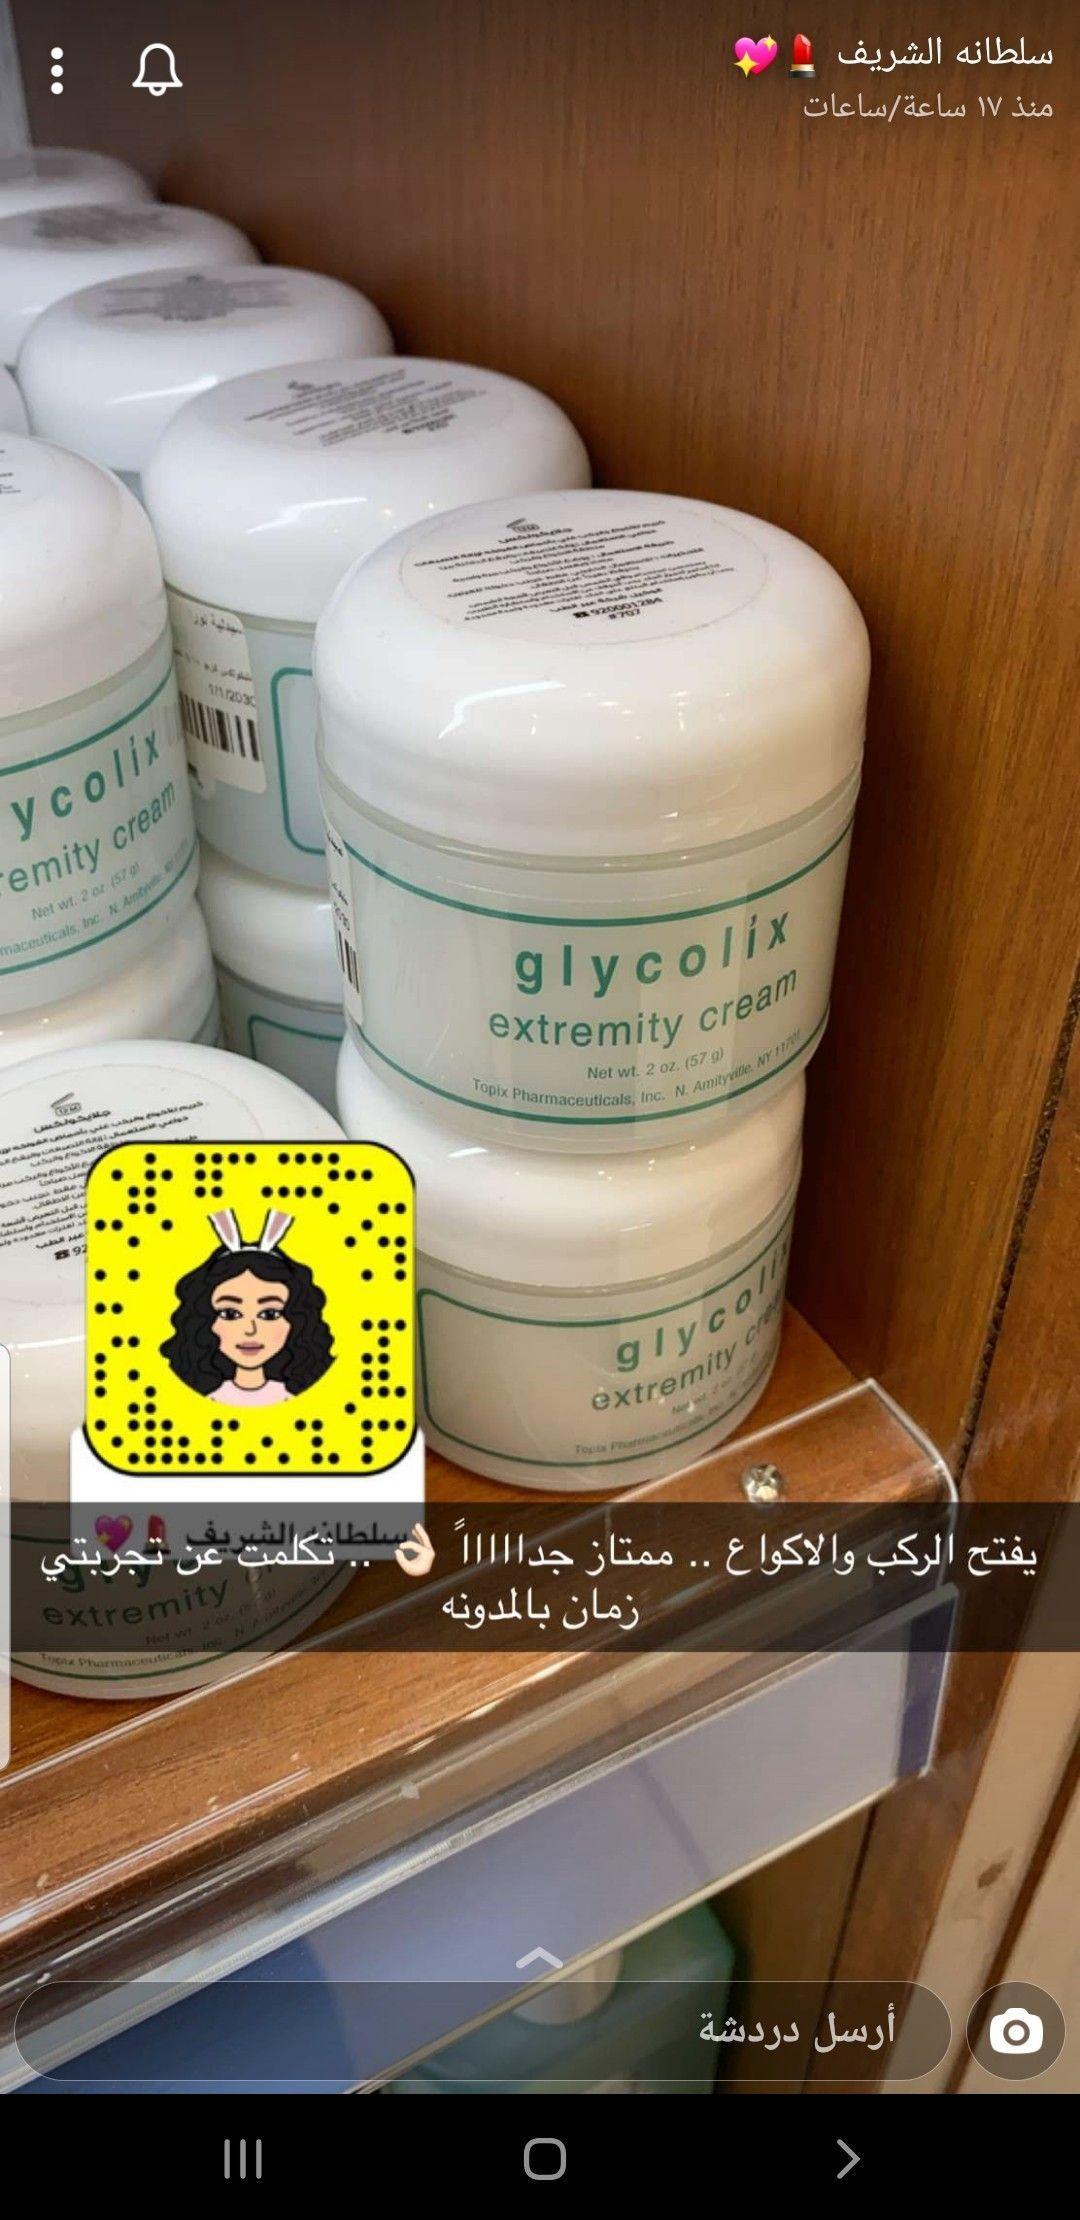 Pin By Hiba Sialiti On خخخ Pretty Skin Care Beauty Recipes Hair Health Skin Care